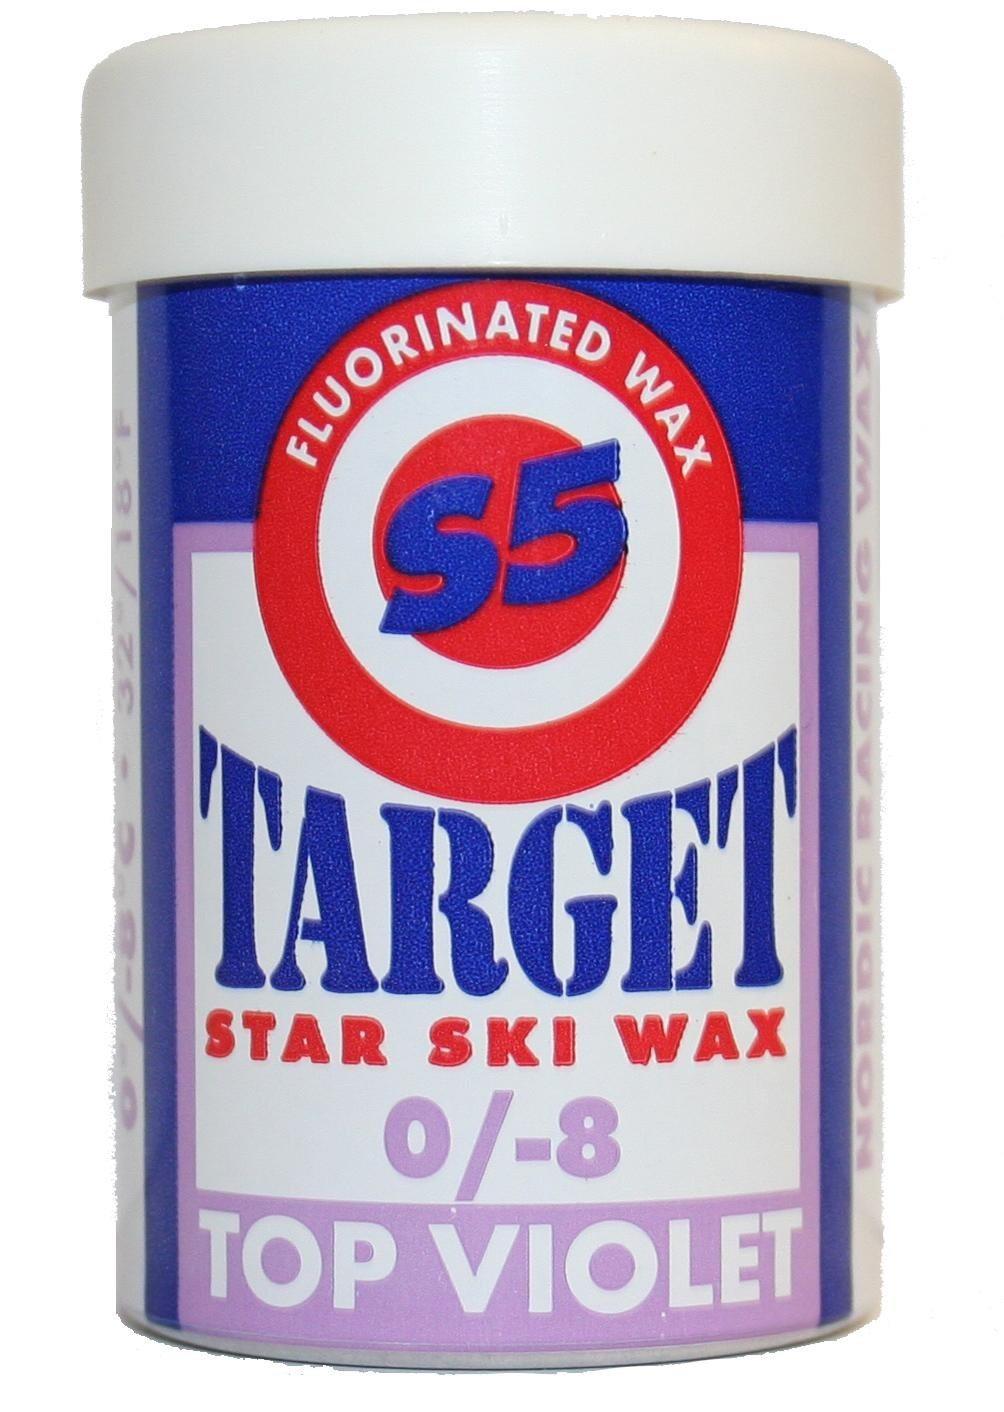 Star Top Violet fluorfestevoks 0 - -8 C